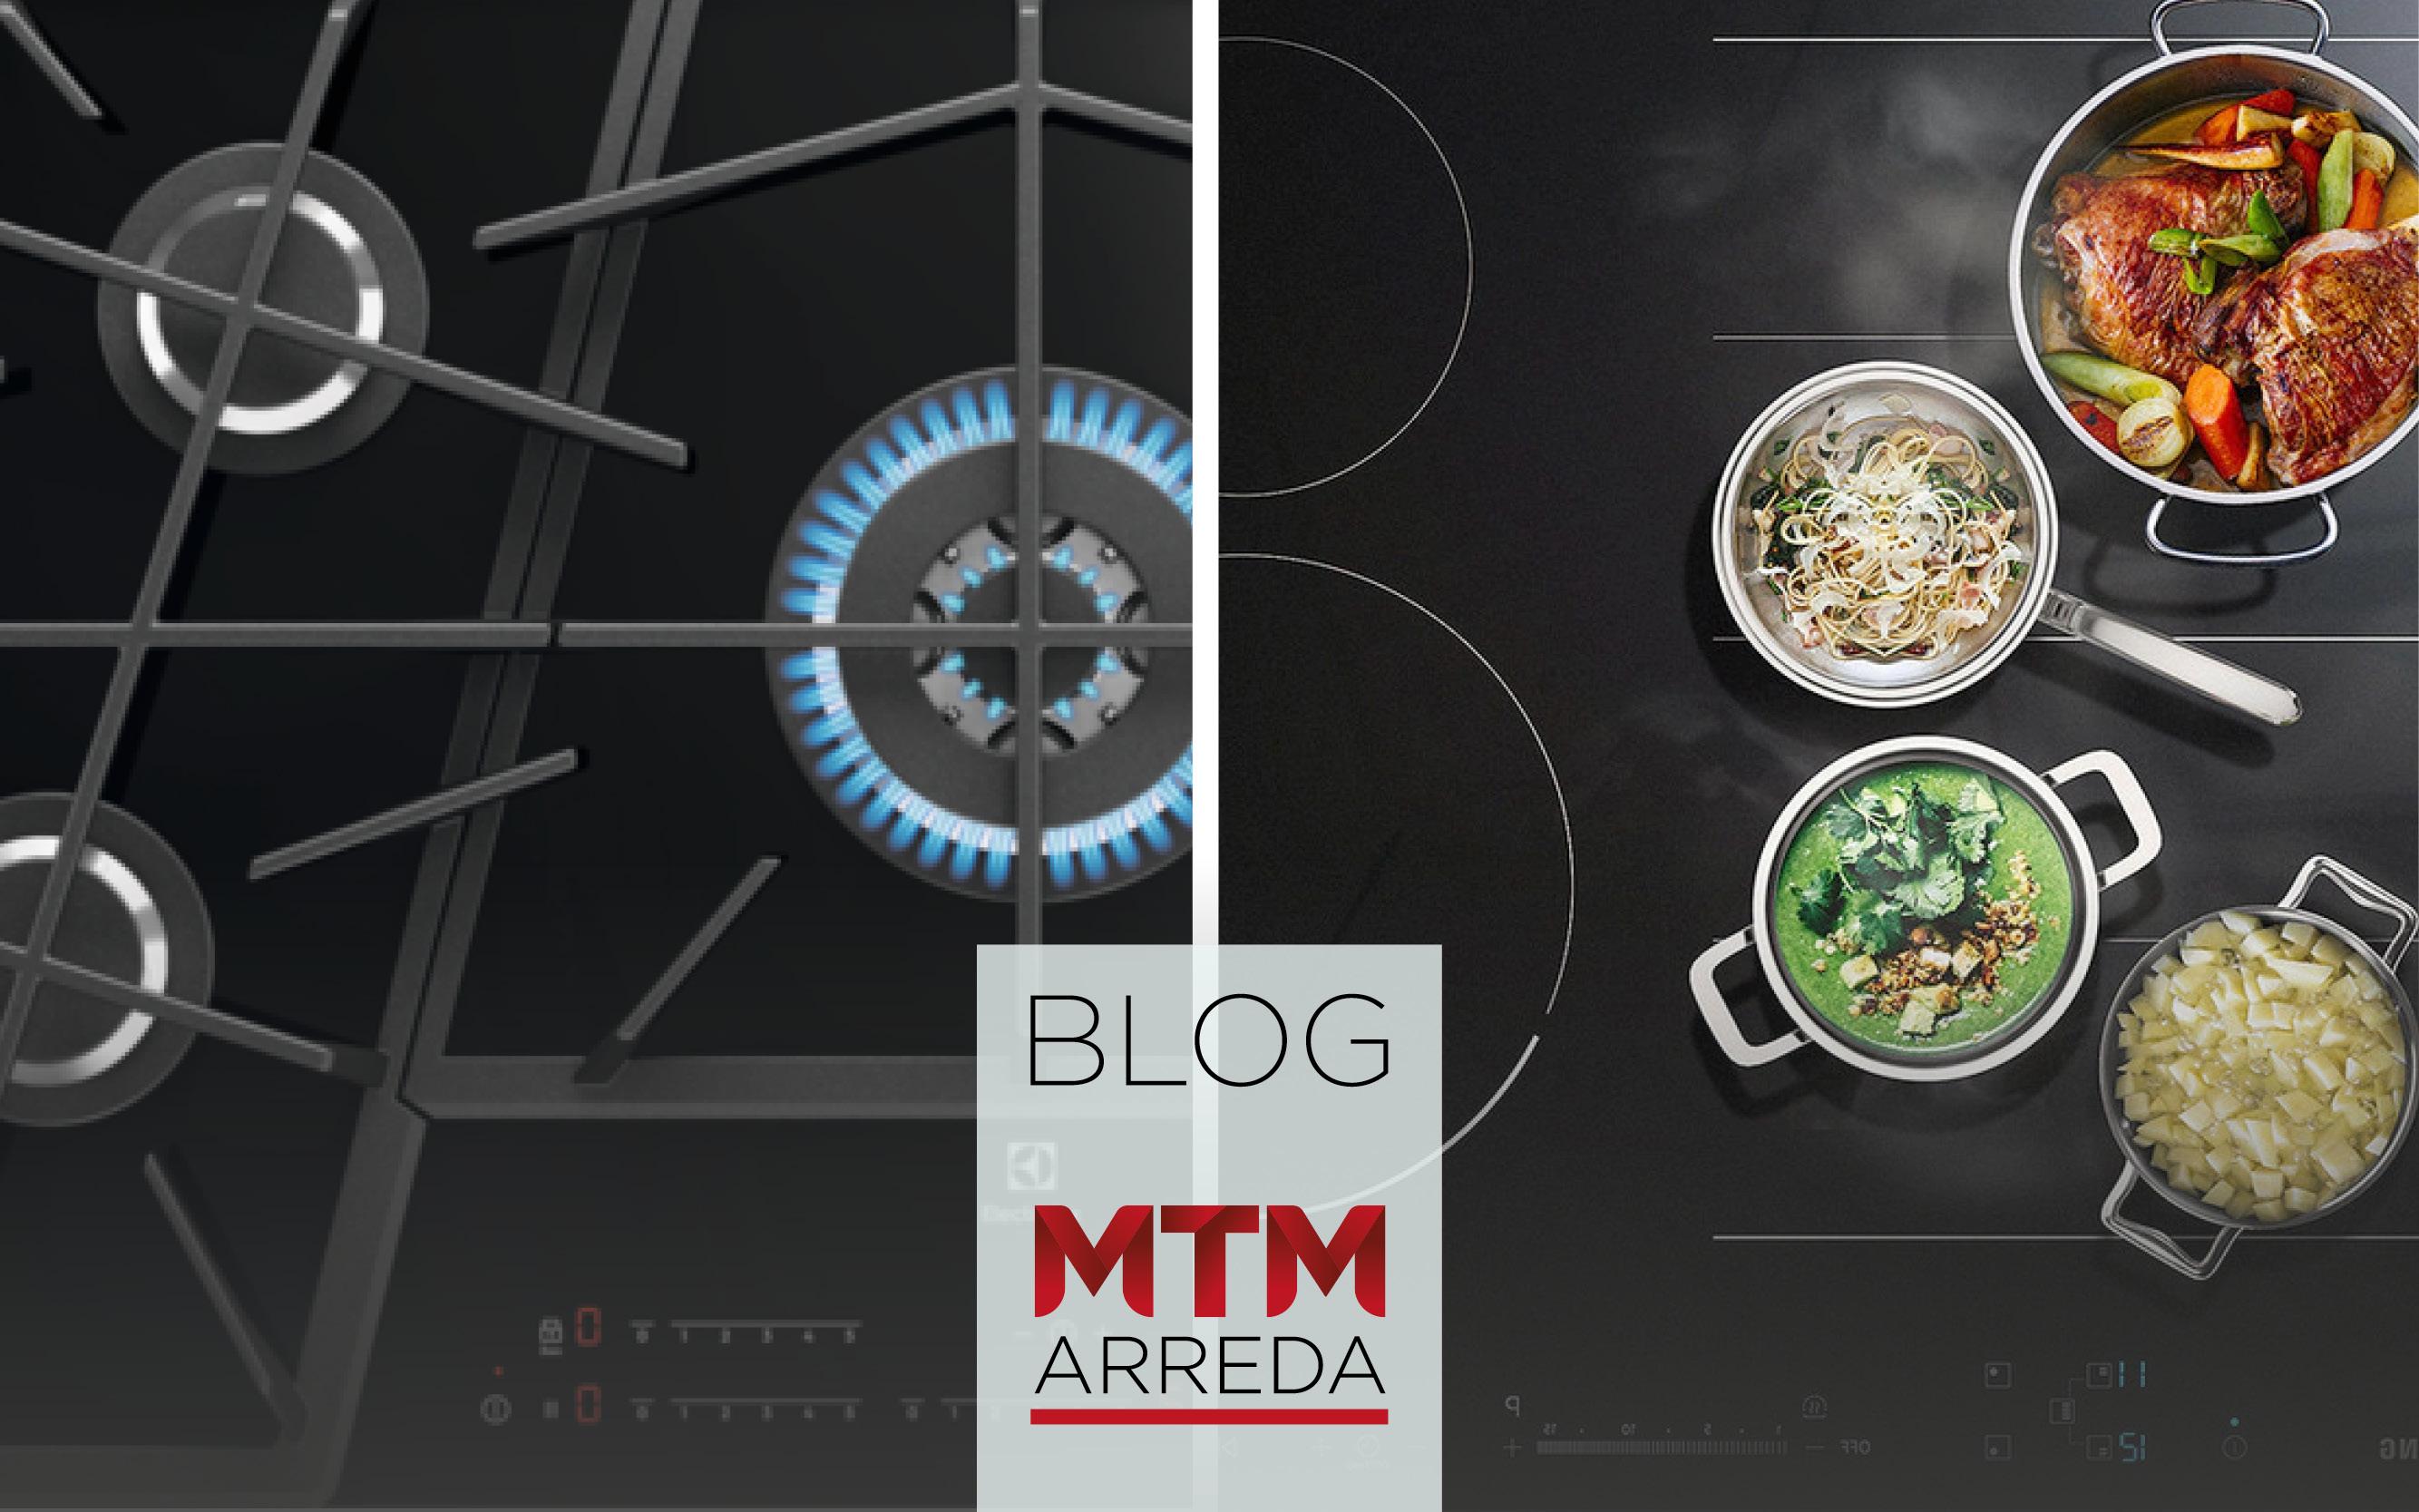 MTM arreda Blog Piastra gas o induzione gatteo